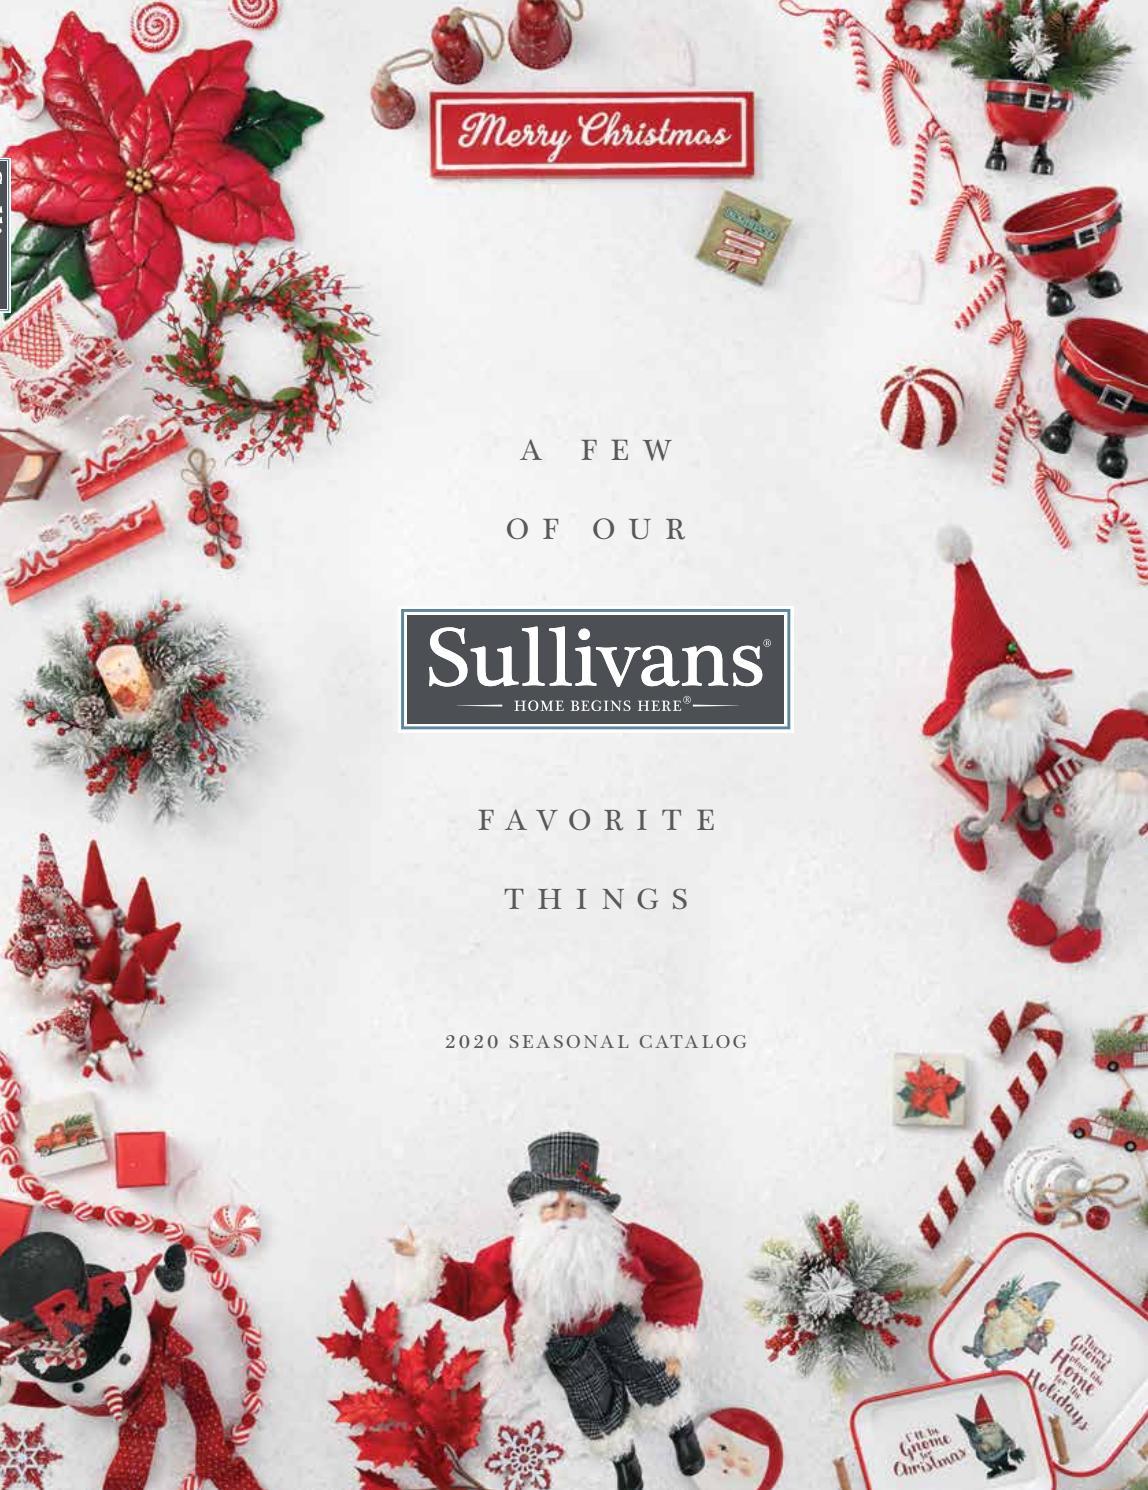 Christmas Catalogs 2020 Sullivans 2020 Seasonal Catalog by Cliff Price and Company   issuu